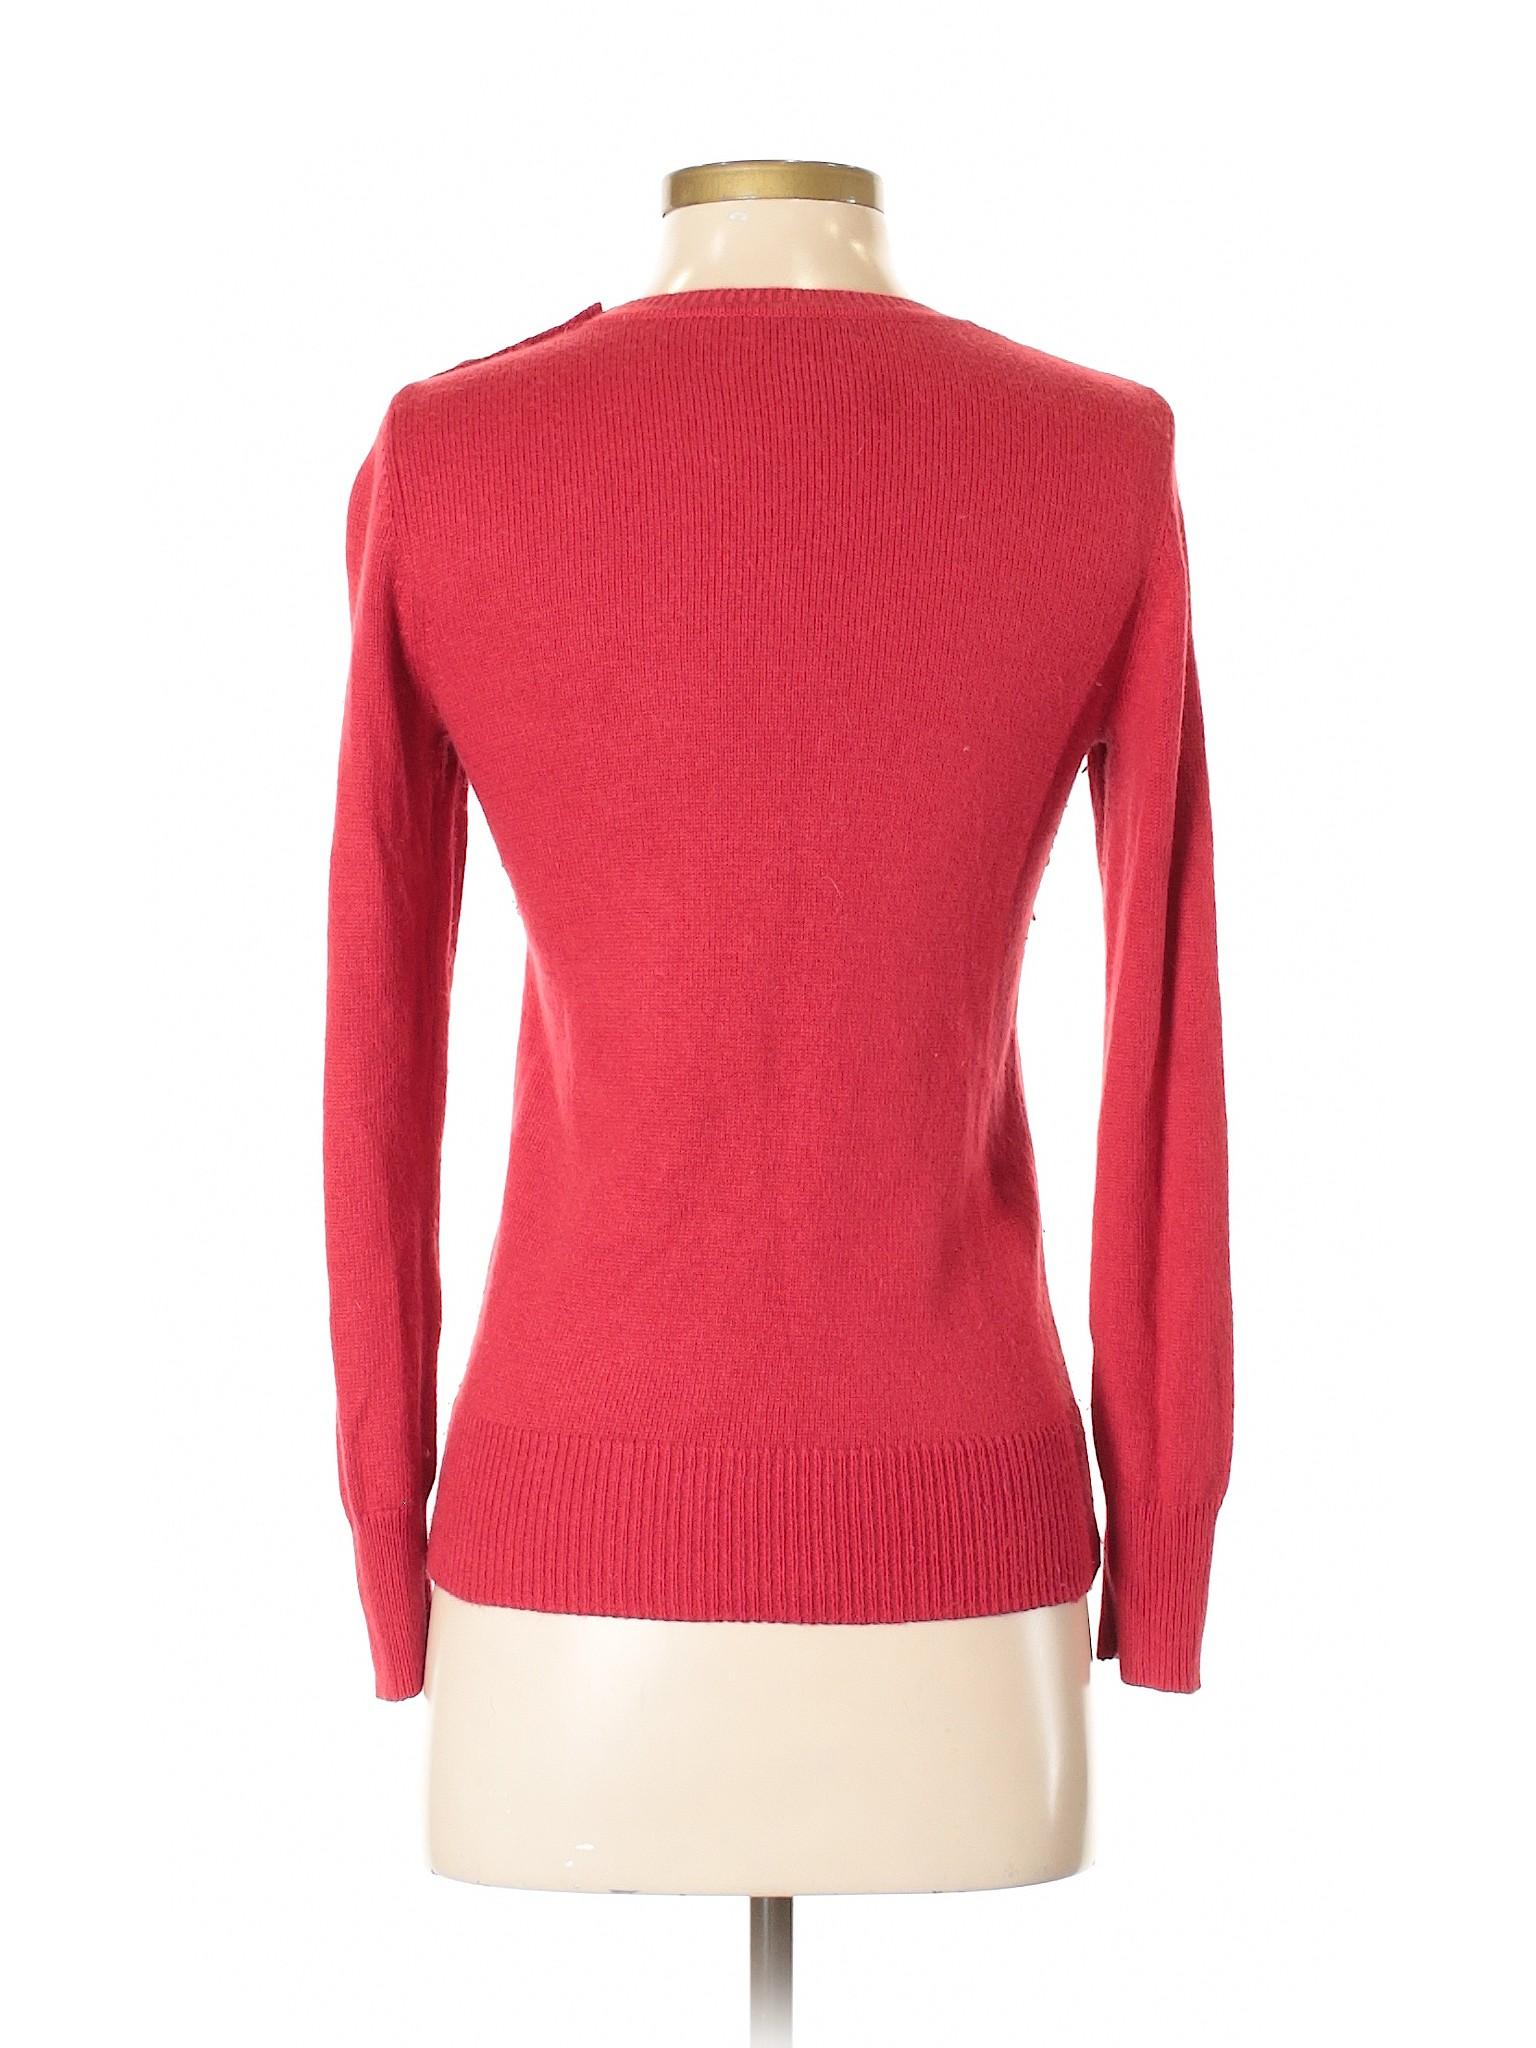 Sweater Gap Gap Boutique Boutique Pullover Boutique Pullover Sweater qWnp8SFB